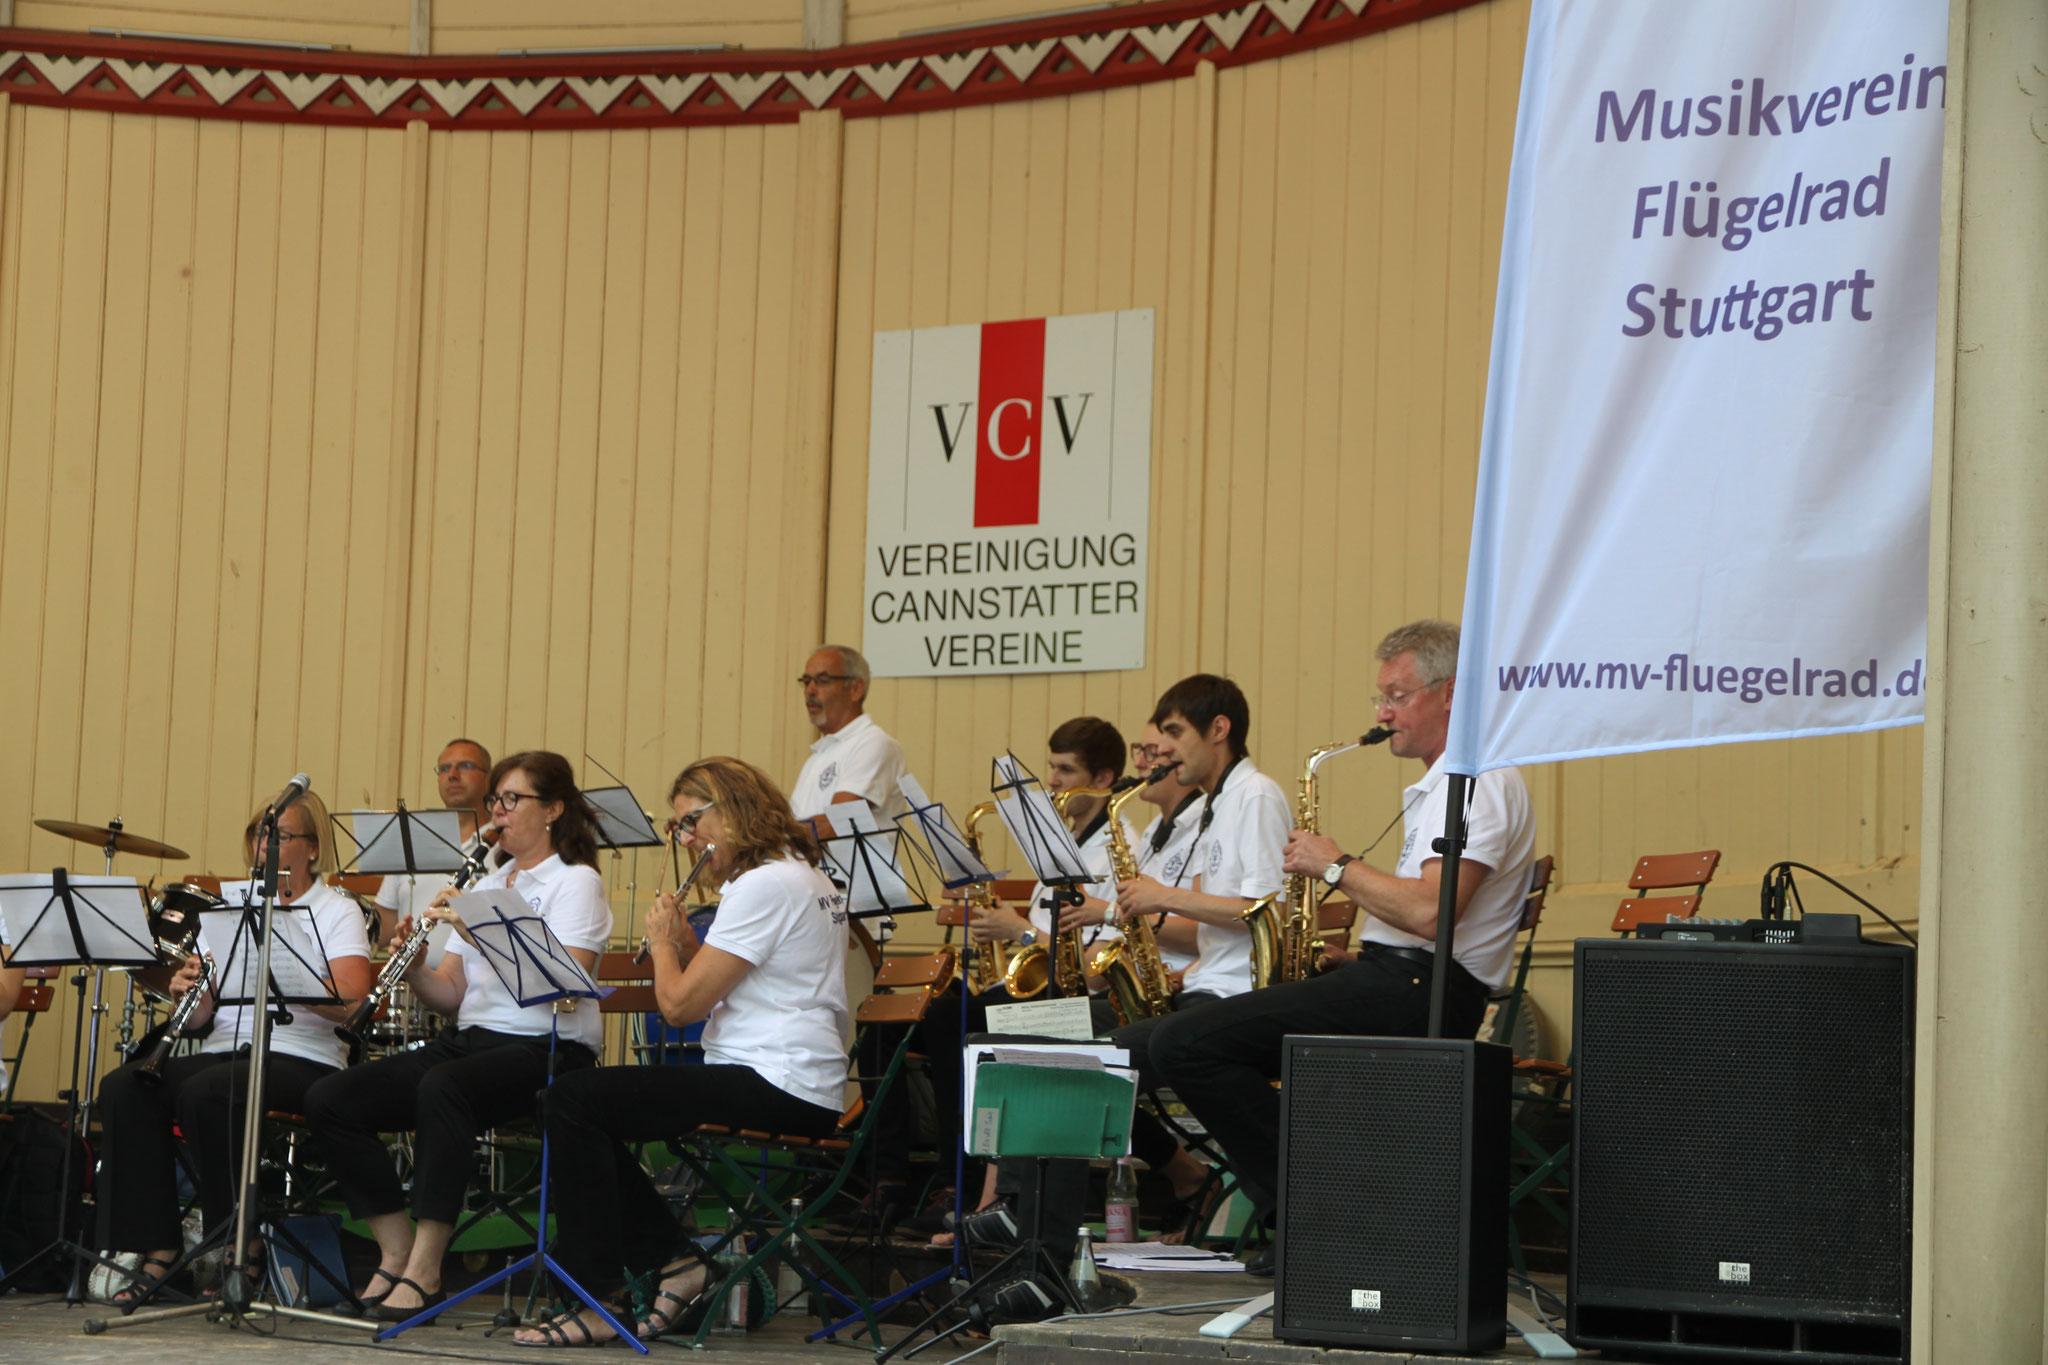 Musikverein Flügelrad Stuttgart